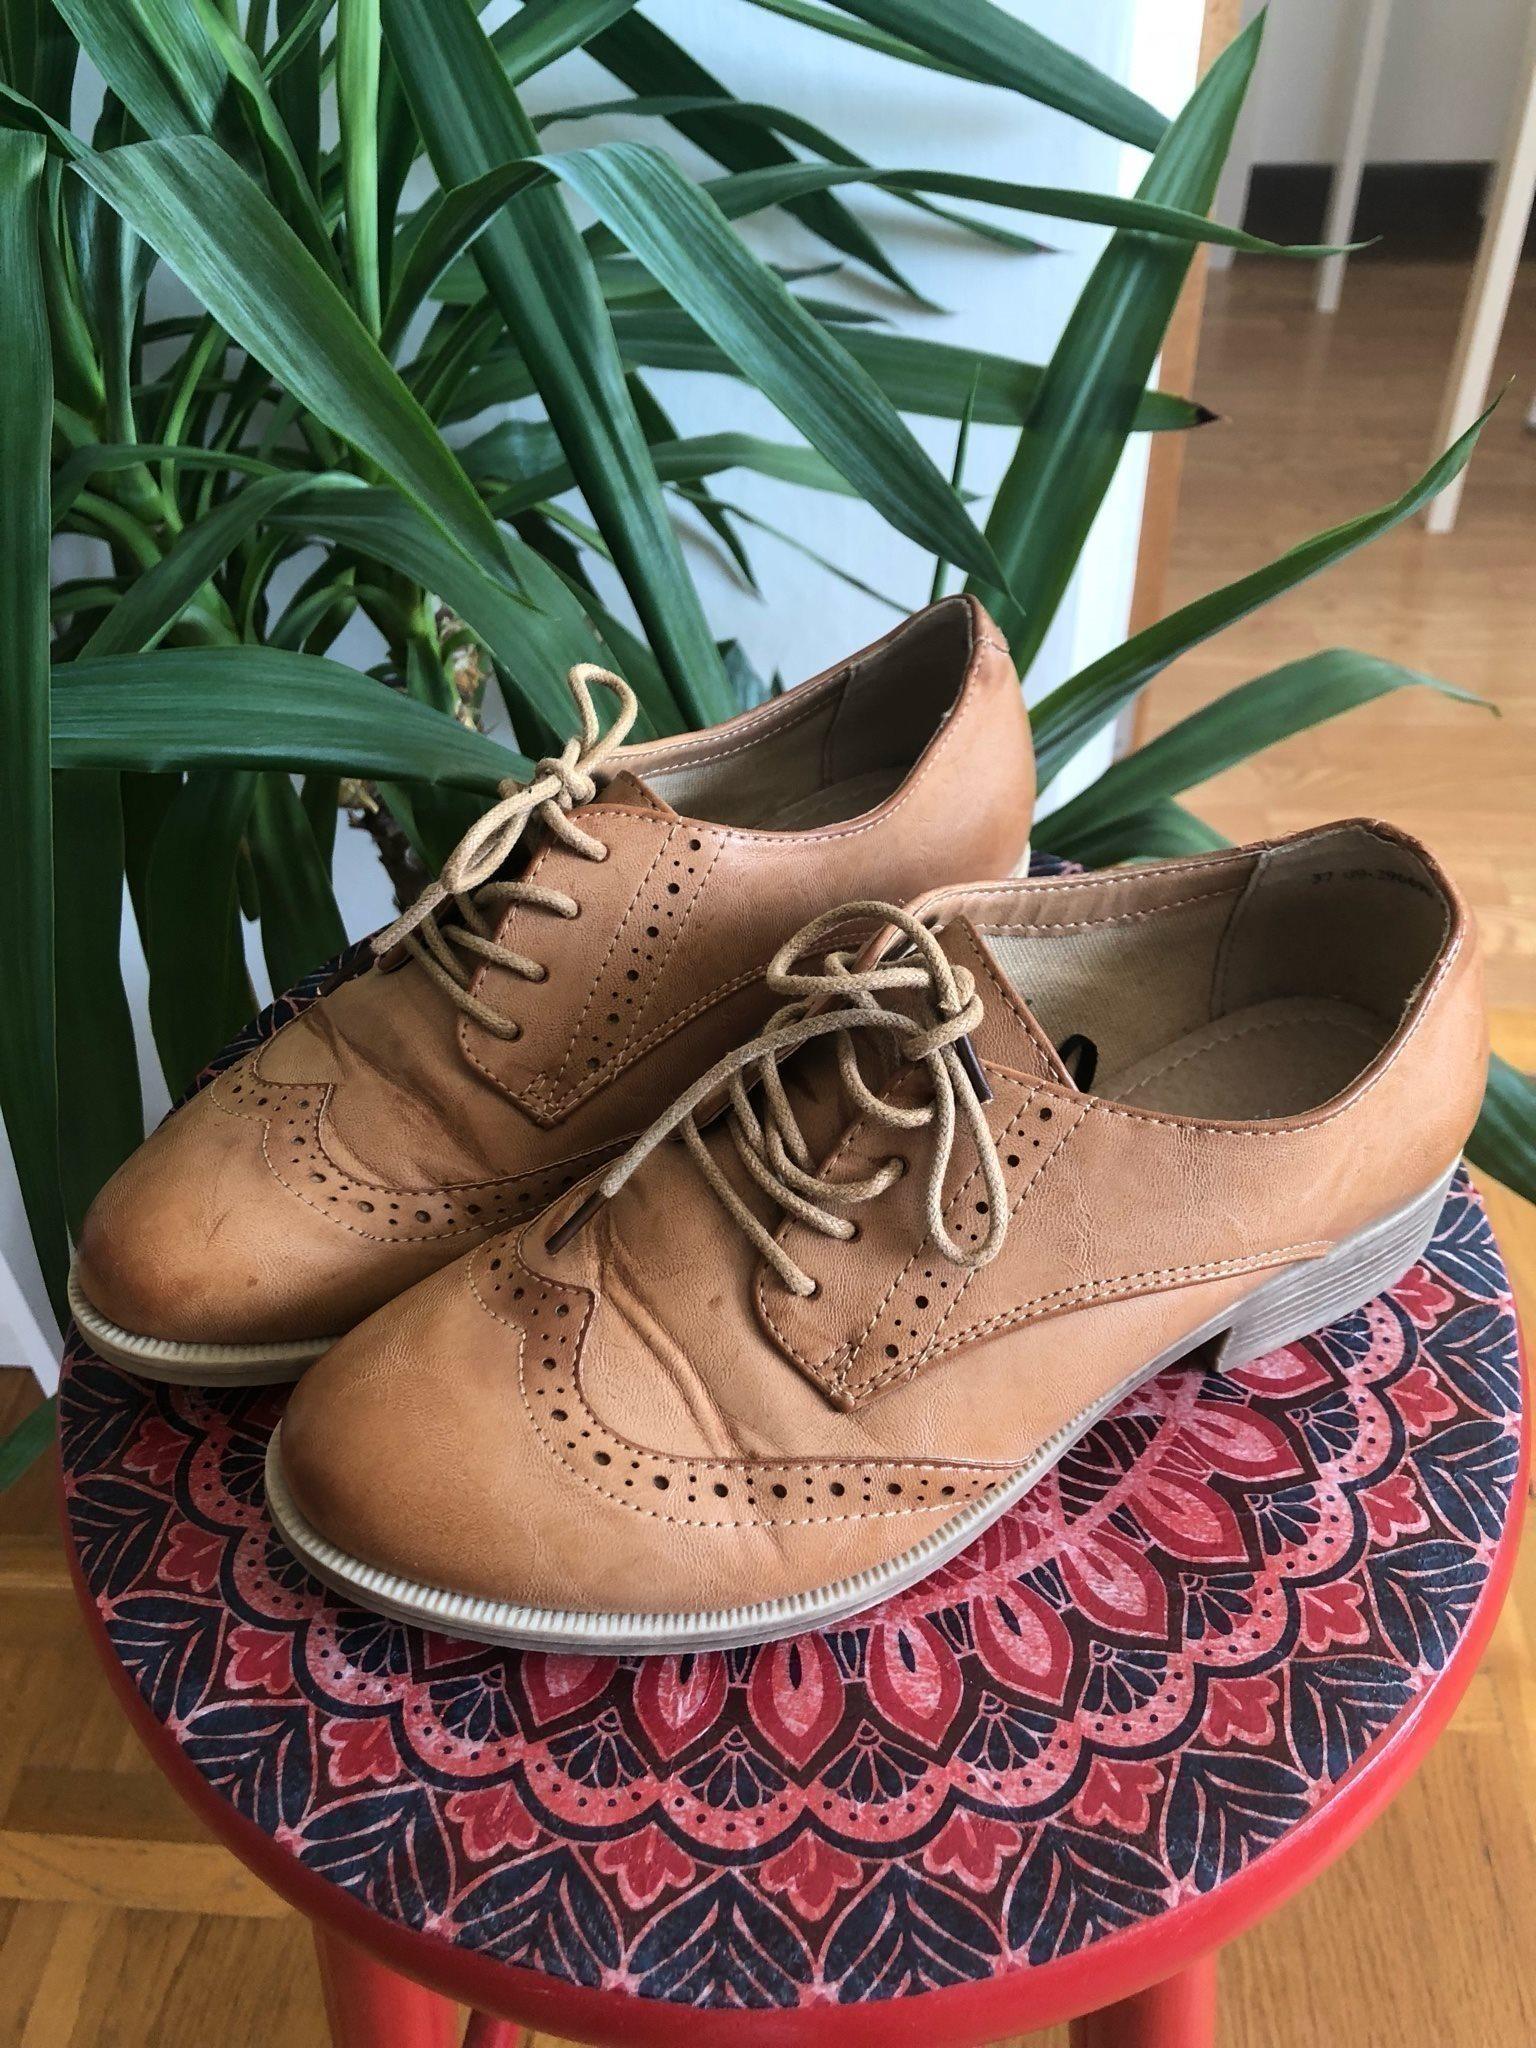 4bcee90a765 Vårskor oxford brouges skor bruna läderimitatio.. (343573439) ᐈ Köp ...